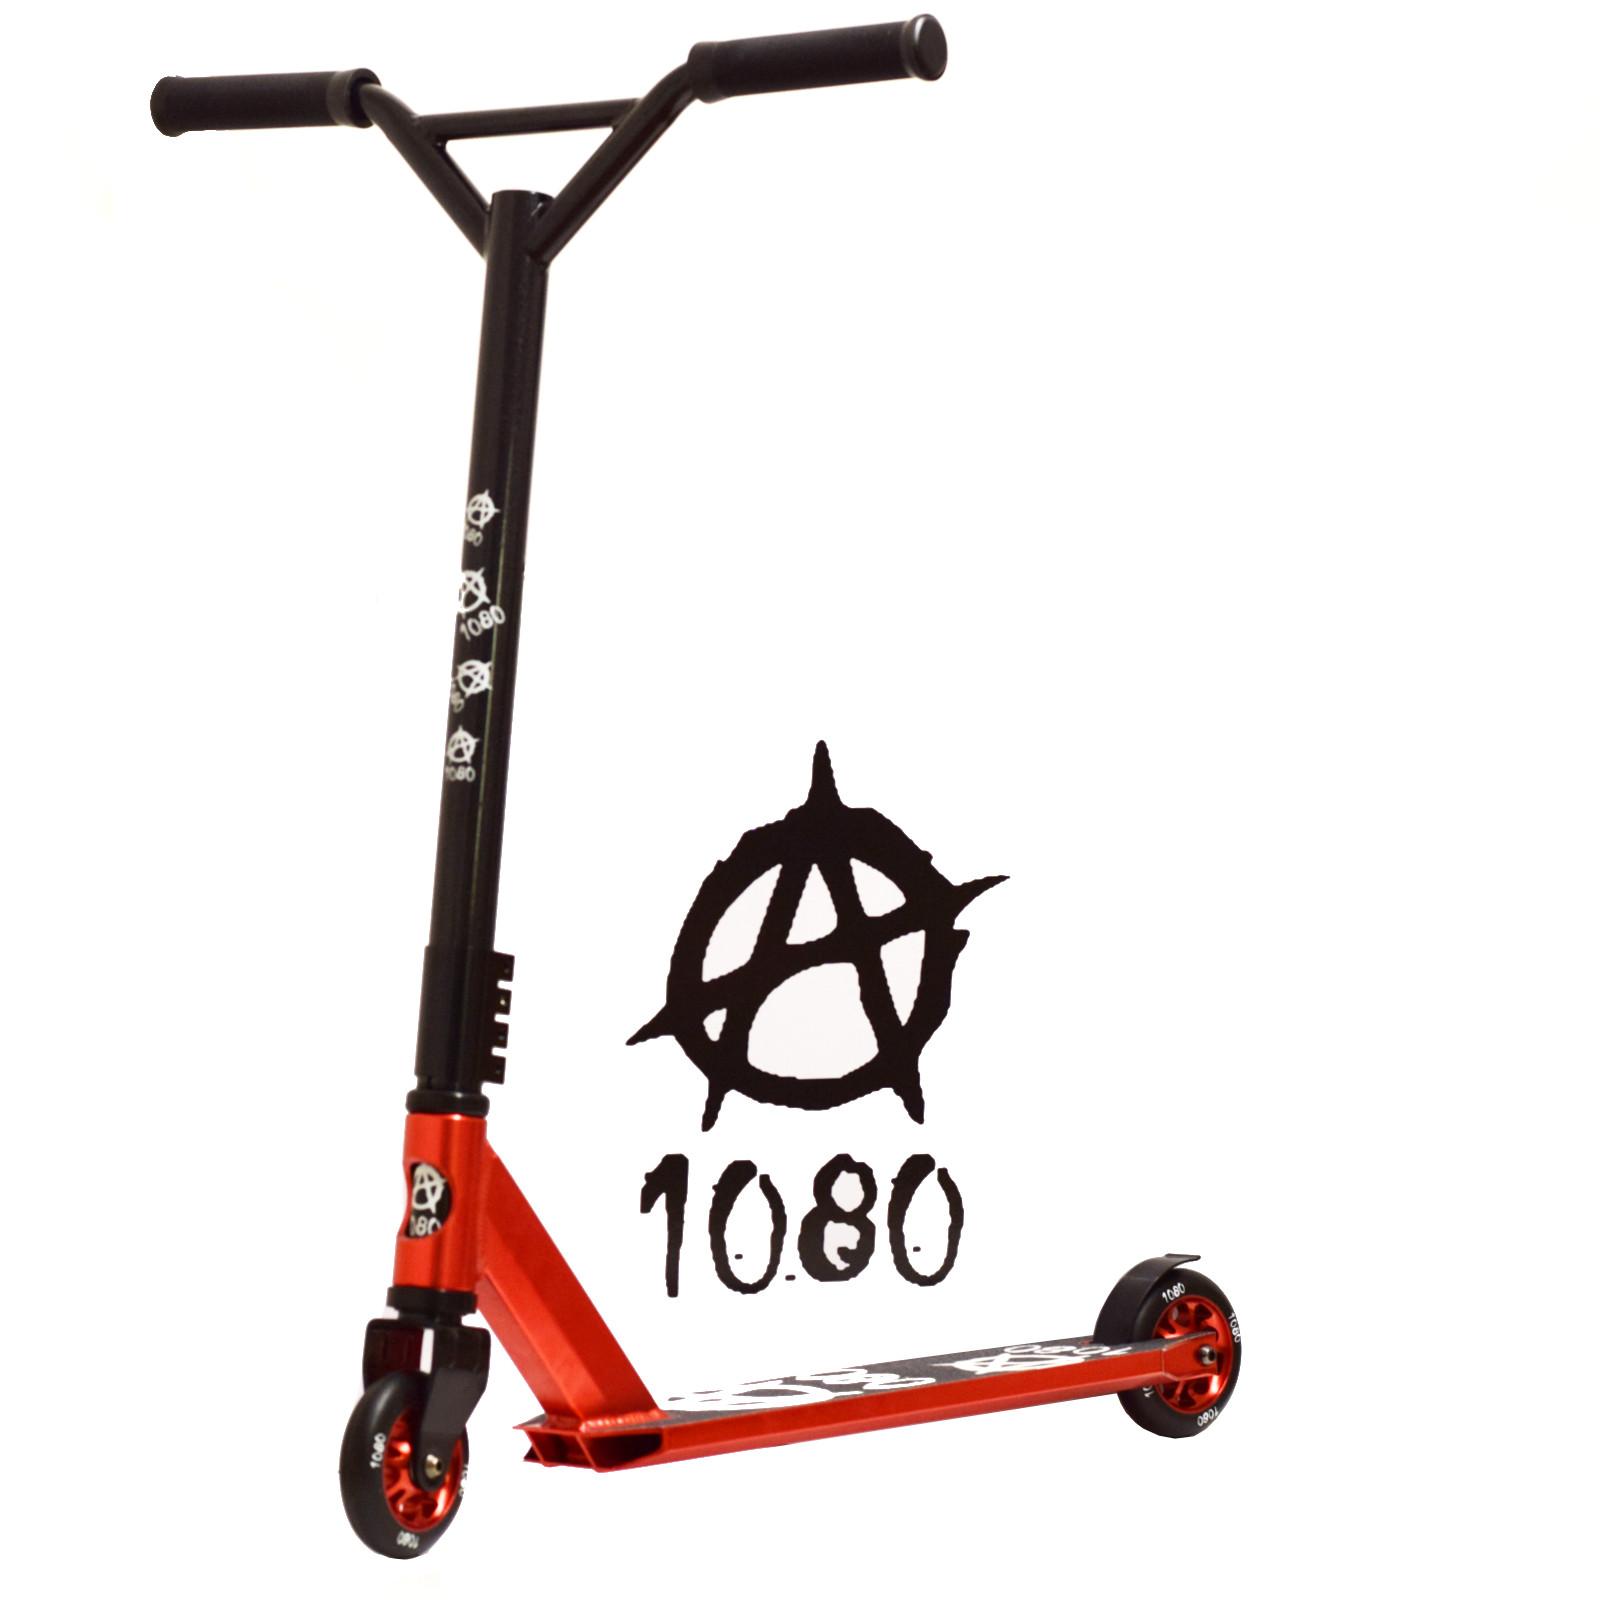 1080 jury stunt scooter alloy custom deck 100mm wheels ebay. Black Bedroom Furniture Sets. Home Design Ideas